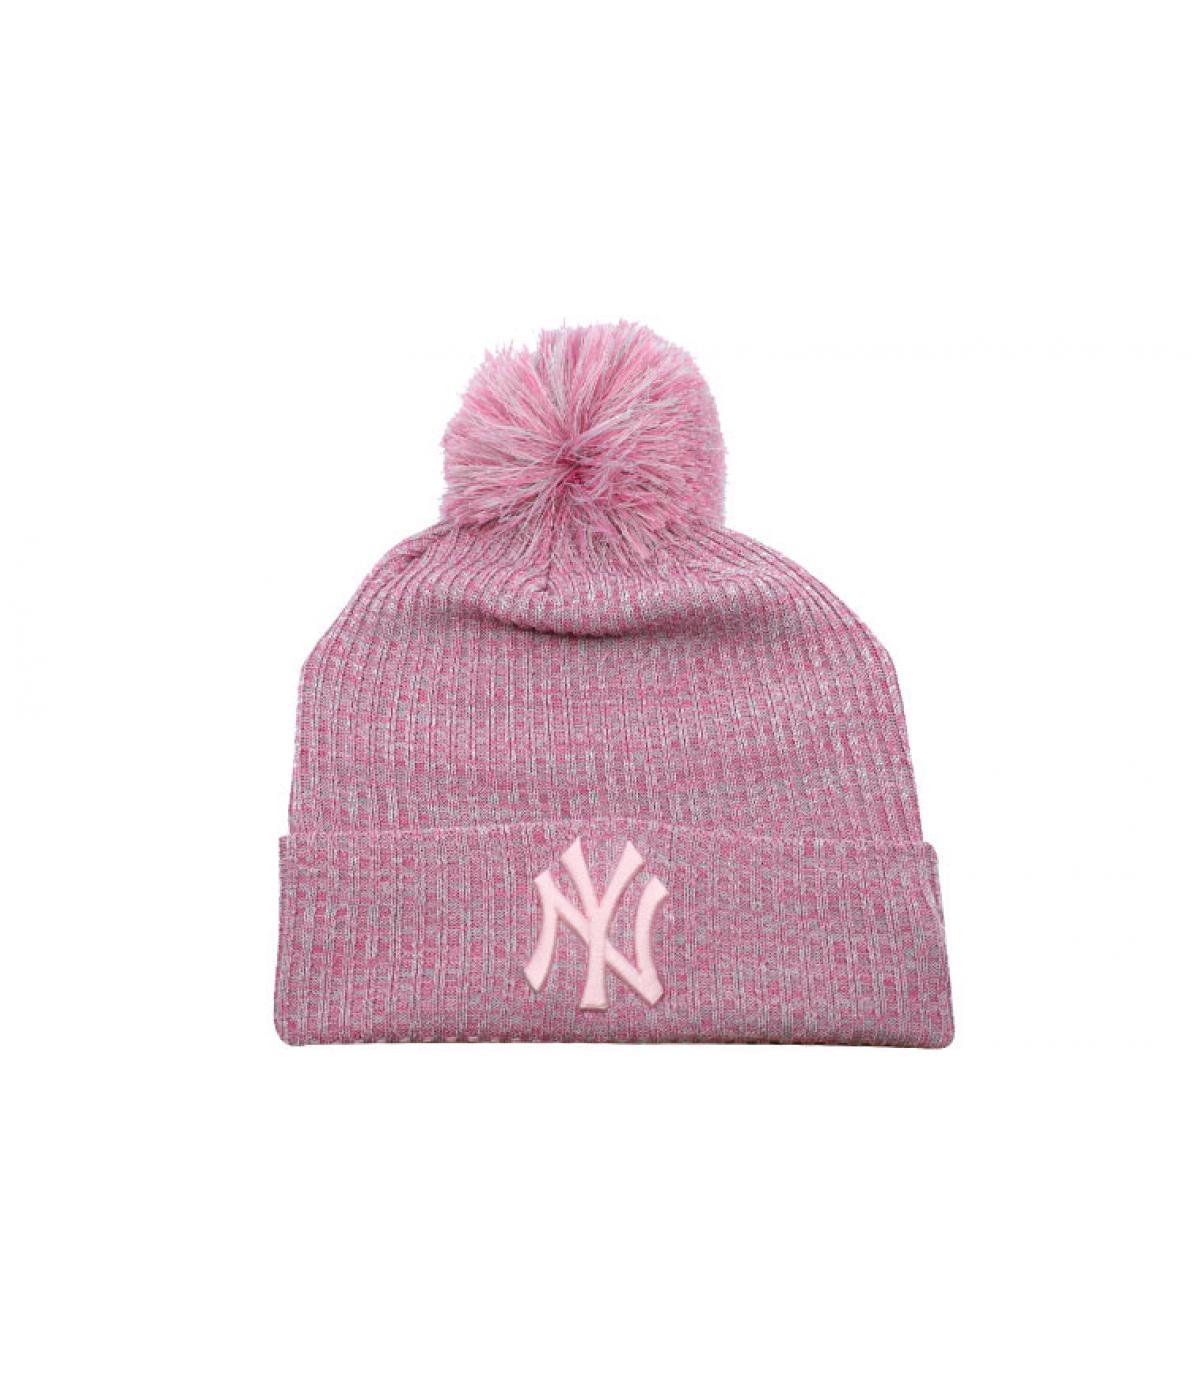 Détails Bonnet Wmns NY Engineered Fit Knit pink - image 2